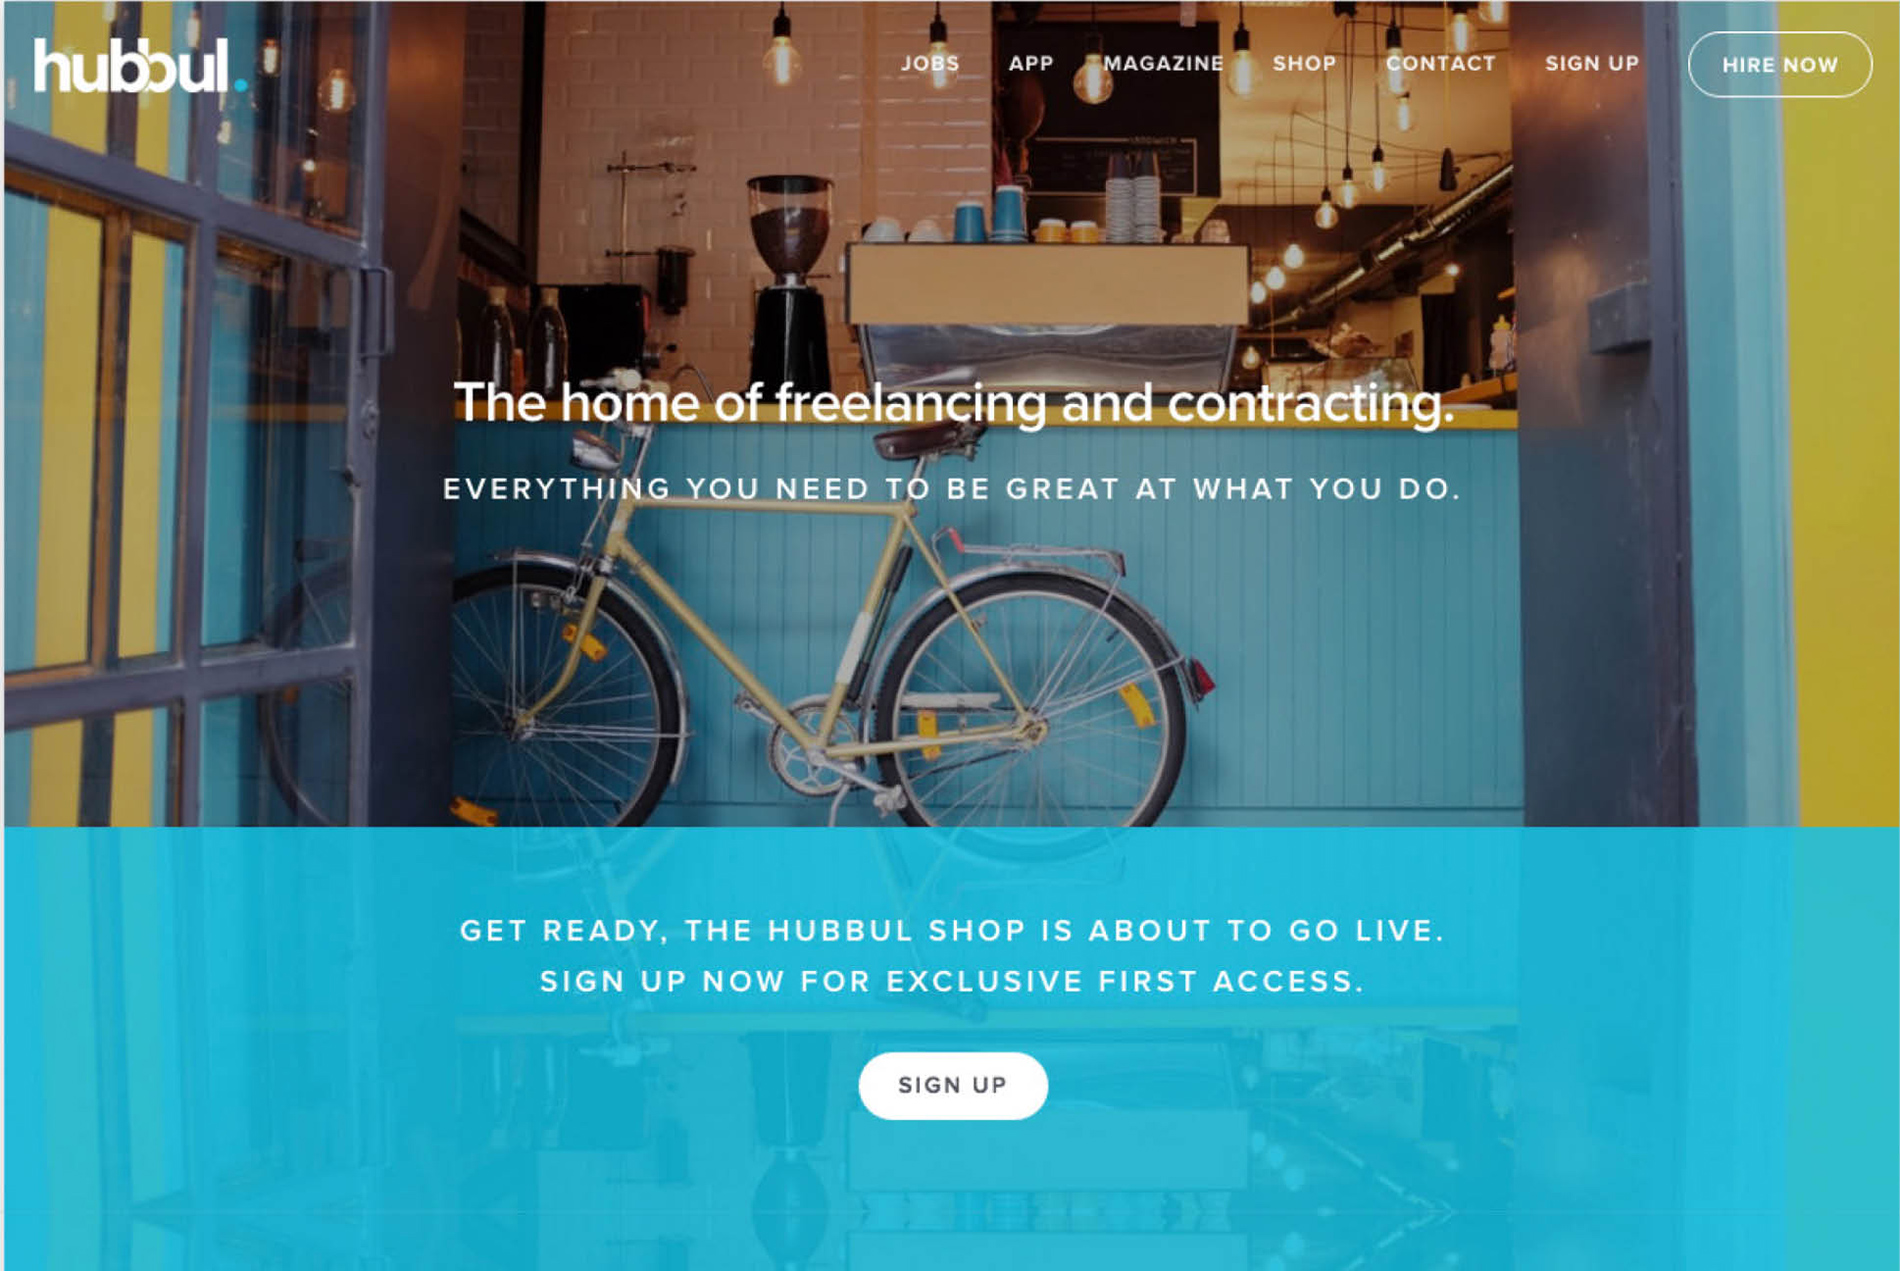 hubbul website | Branding, Strategy and Logo Design | Independent Marketing | IM London | London Branding Agency